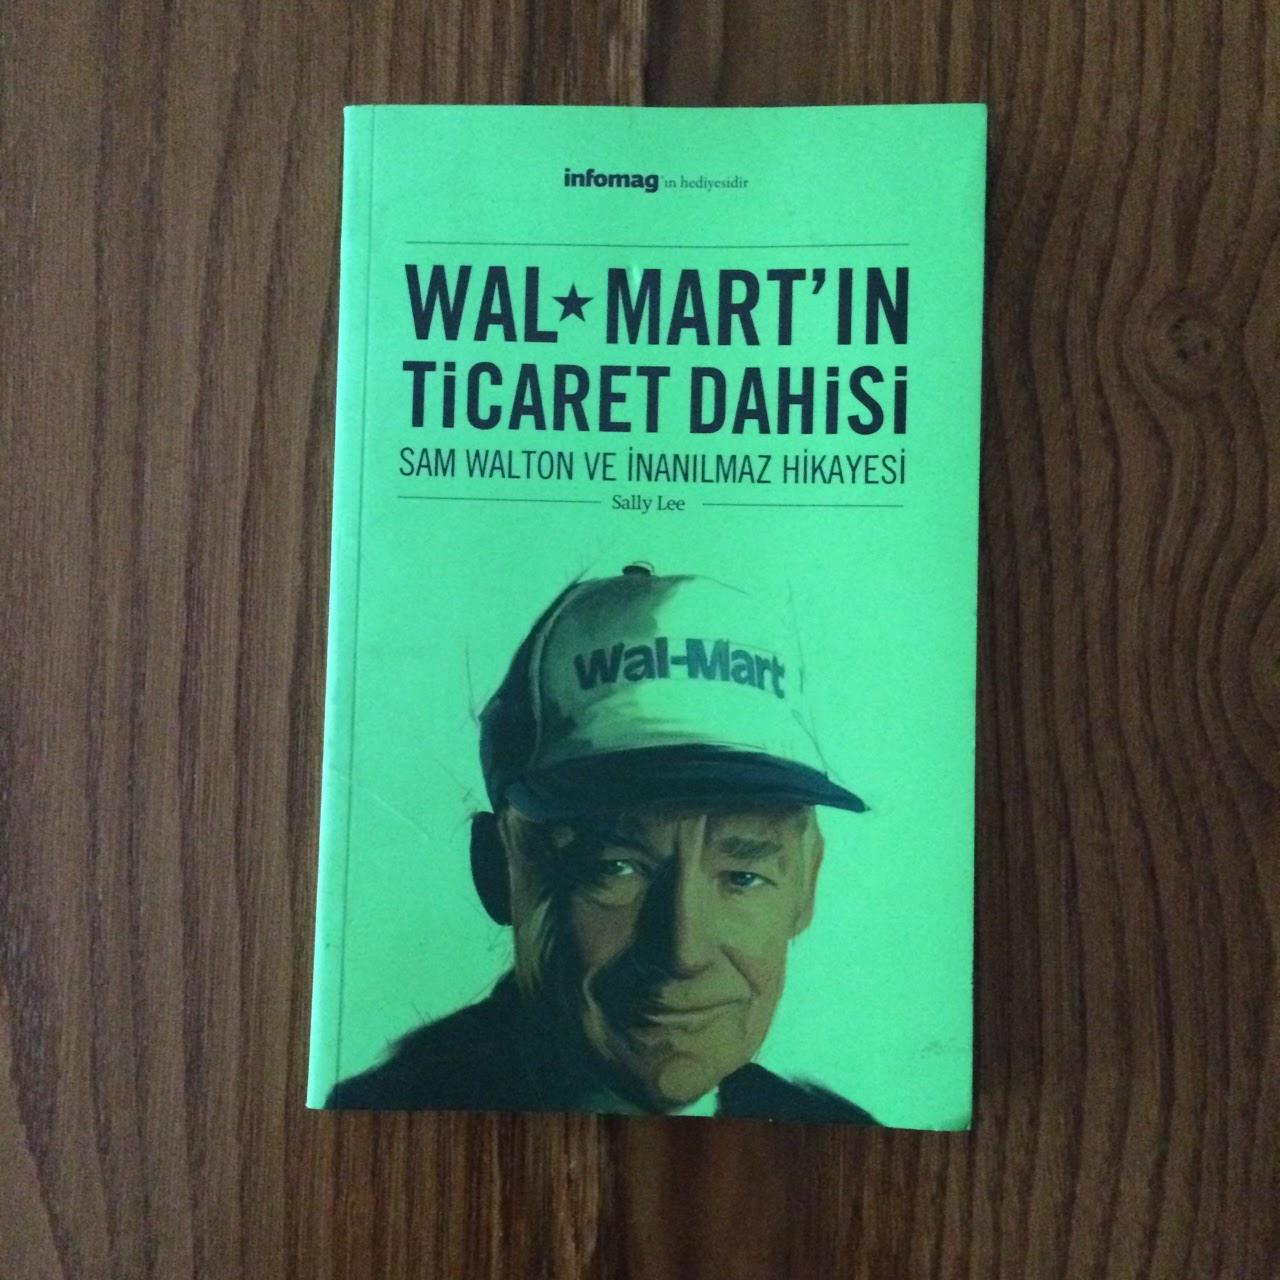 WalMart'in Ticaret Dahisi - Sam Walton & Inanilmaz Hikayesi  (Kitap)